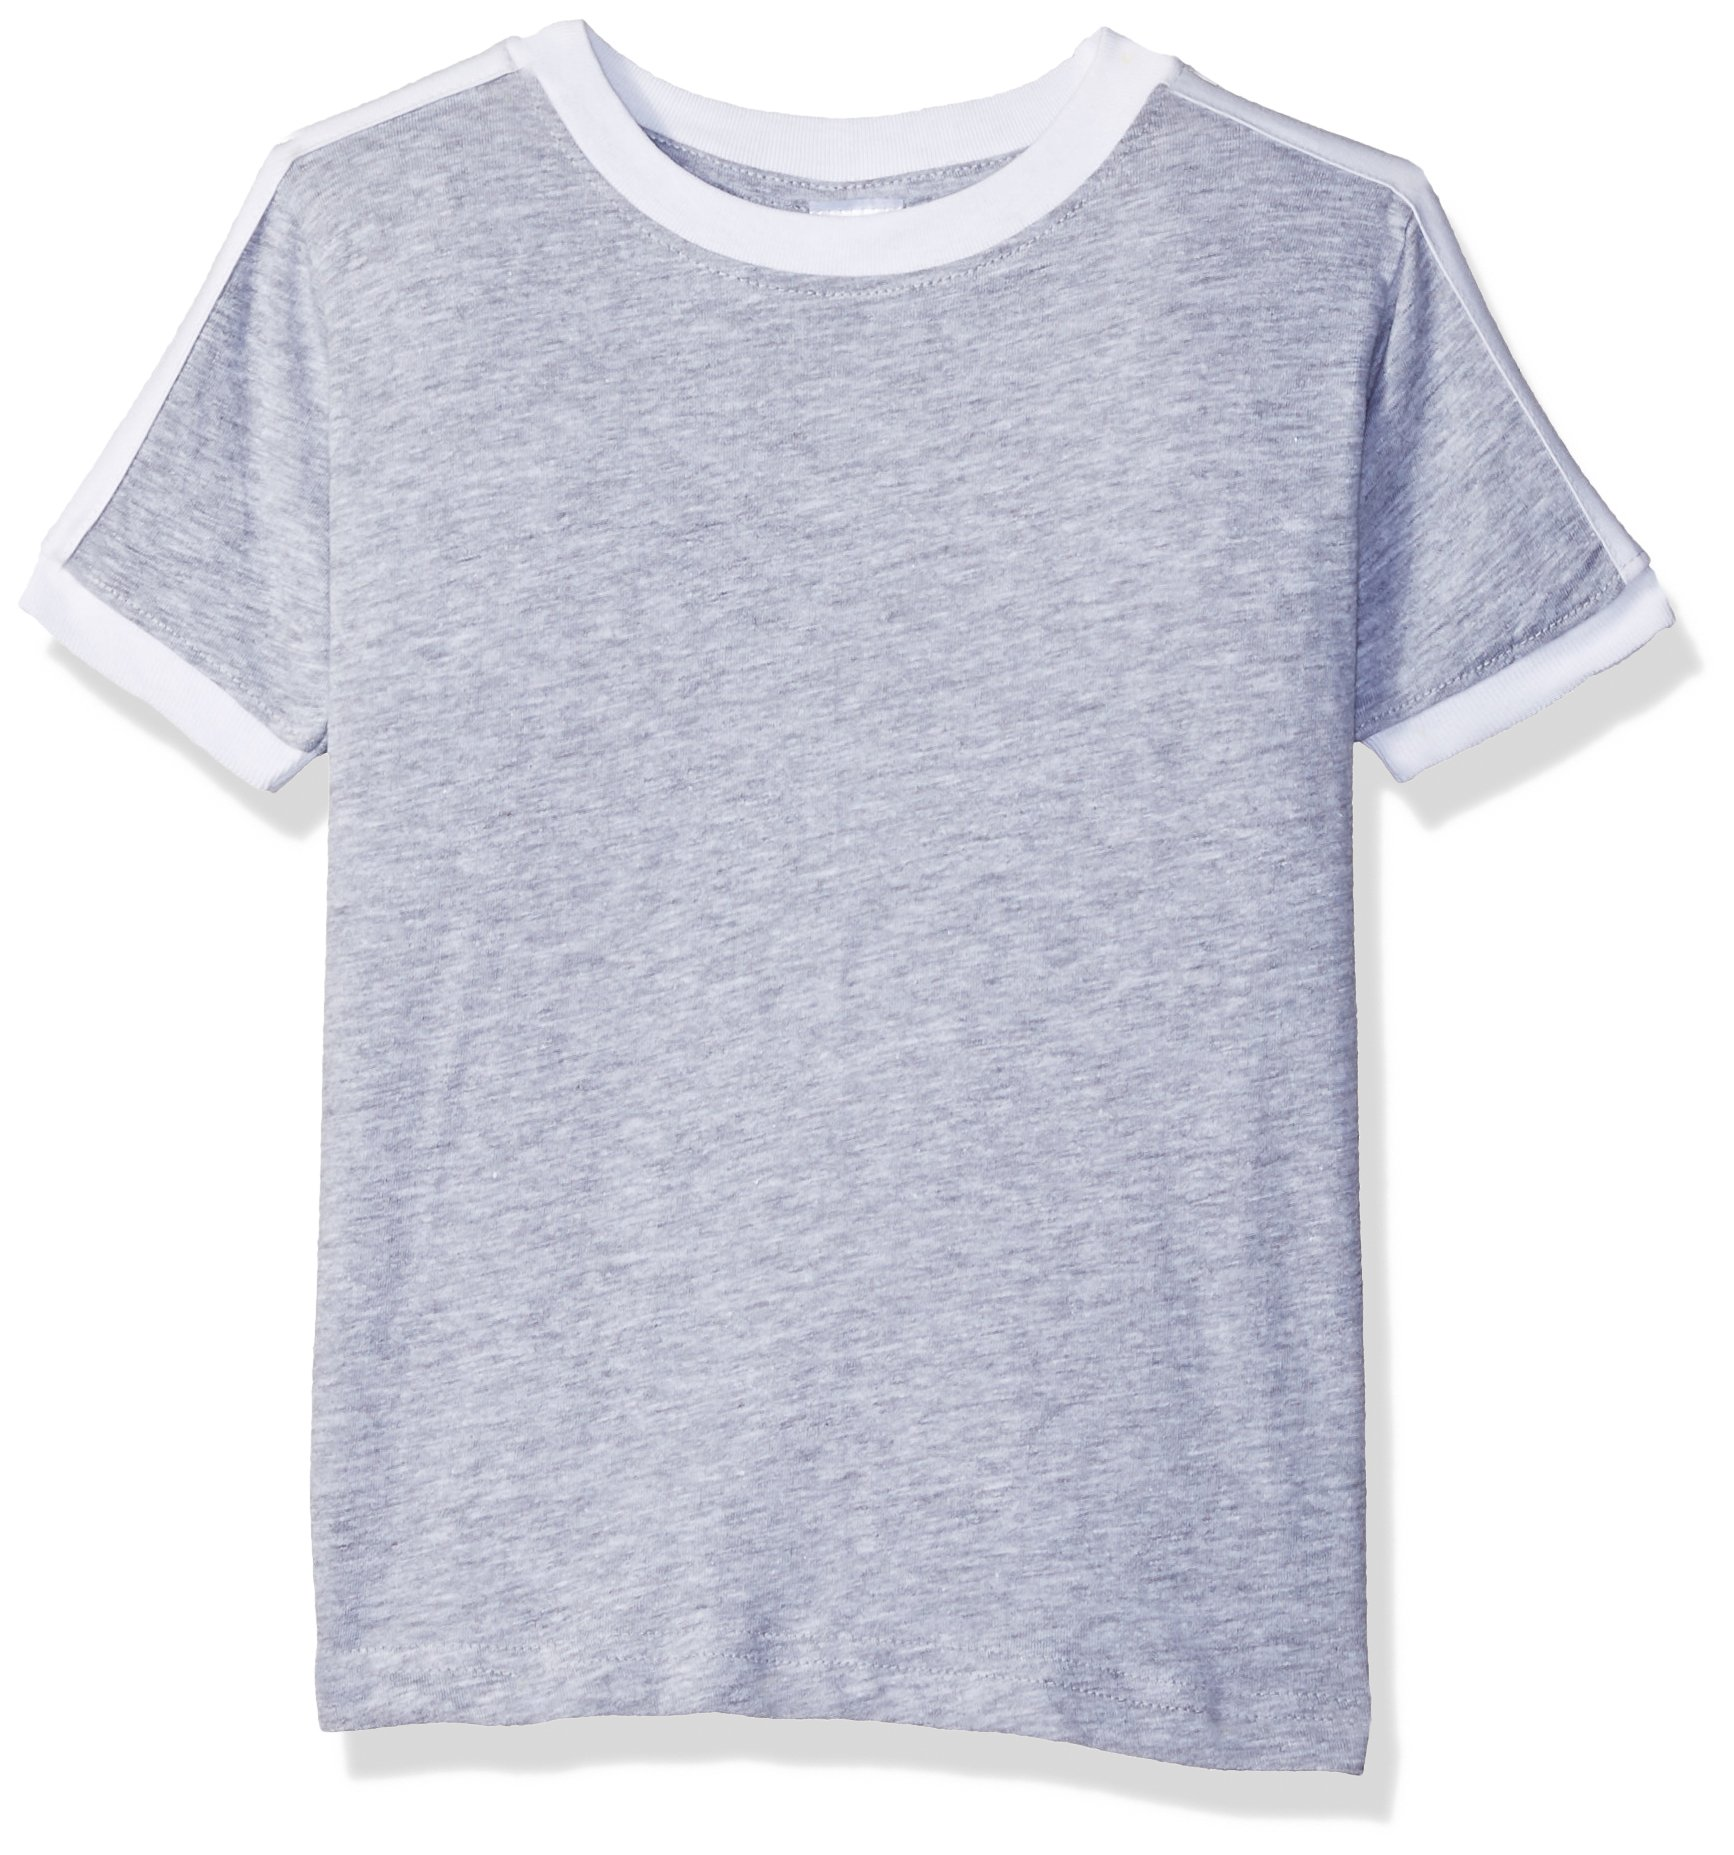 Clementine Toddler Kids Soccer Ringer Fine Jersey T-Shirt, Heather/White, 2T